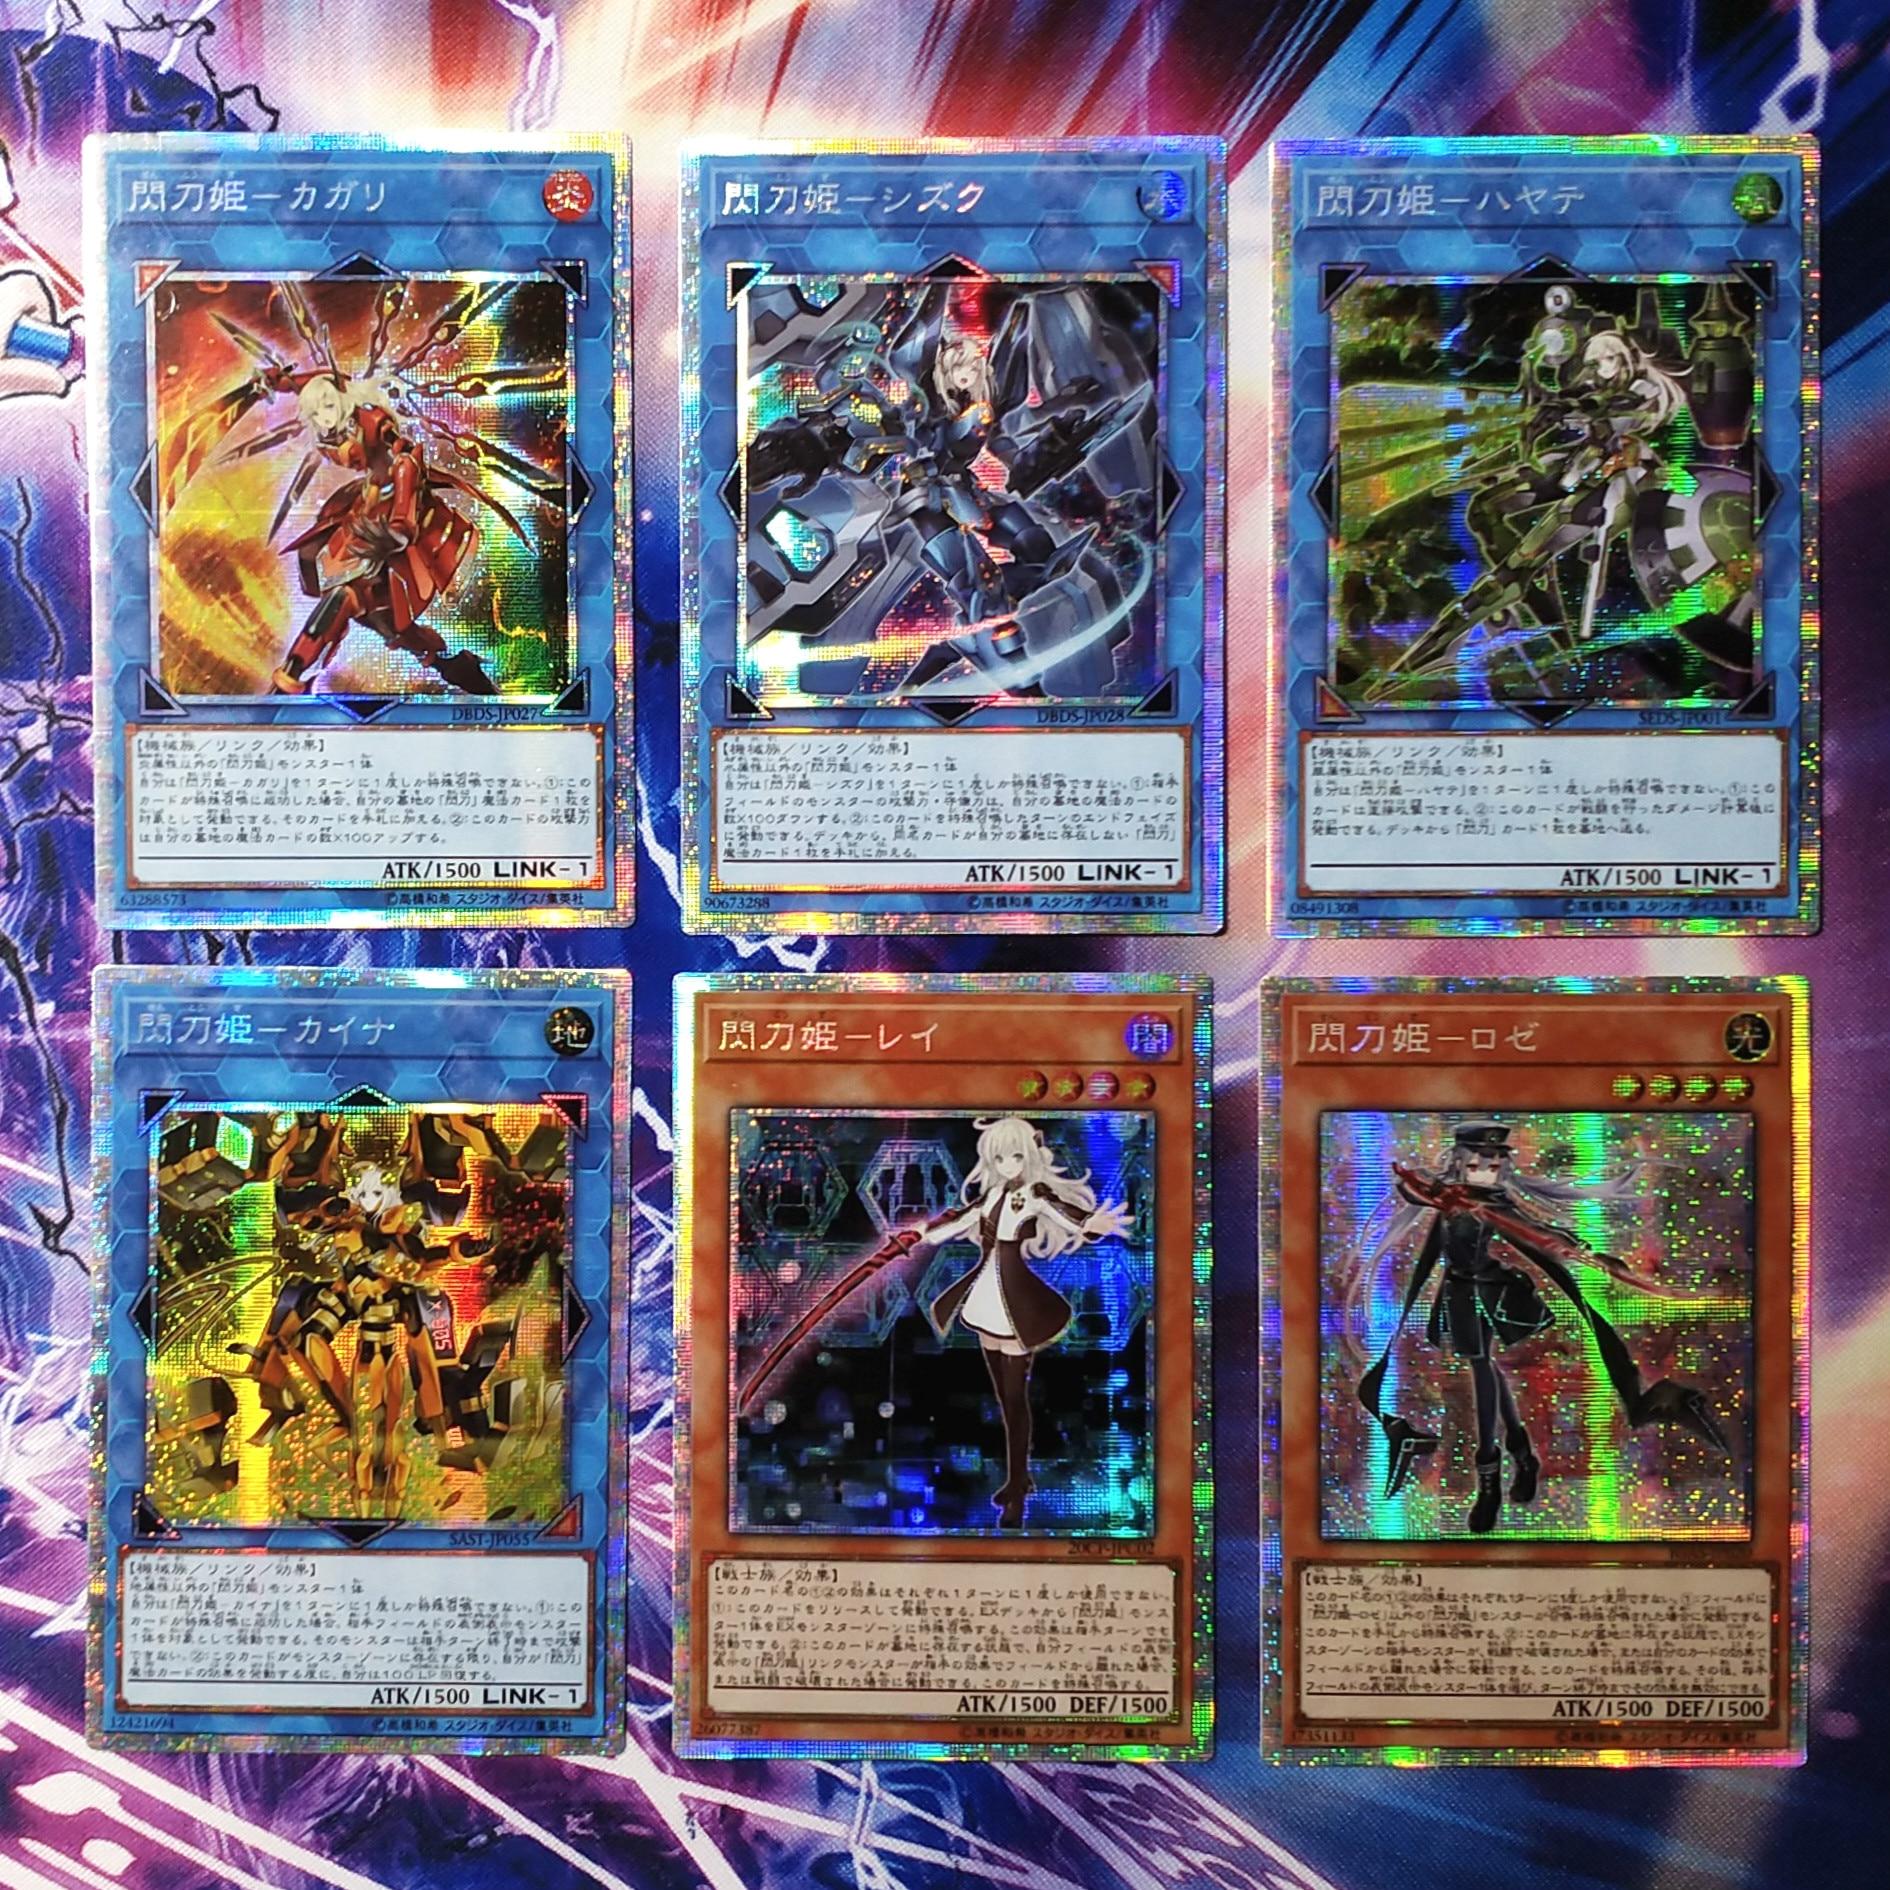 6 Styles Yu Gi Oh Sky Striker Ace Raye Kagari Shizuku DIY Colorful Toys Hobbies Hobby Collectibles Game Collection Anime Cards